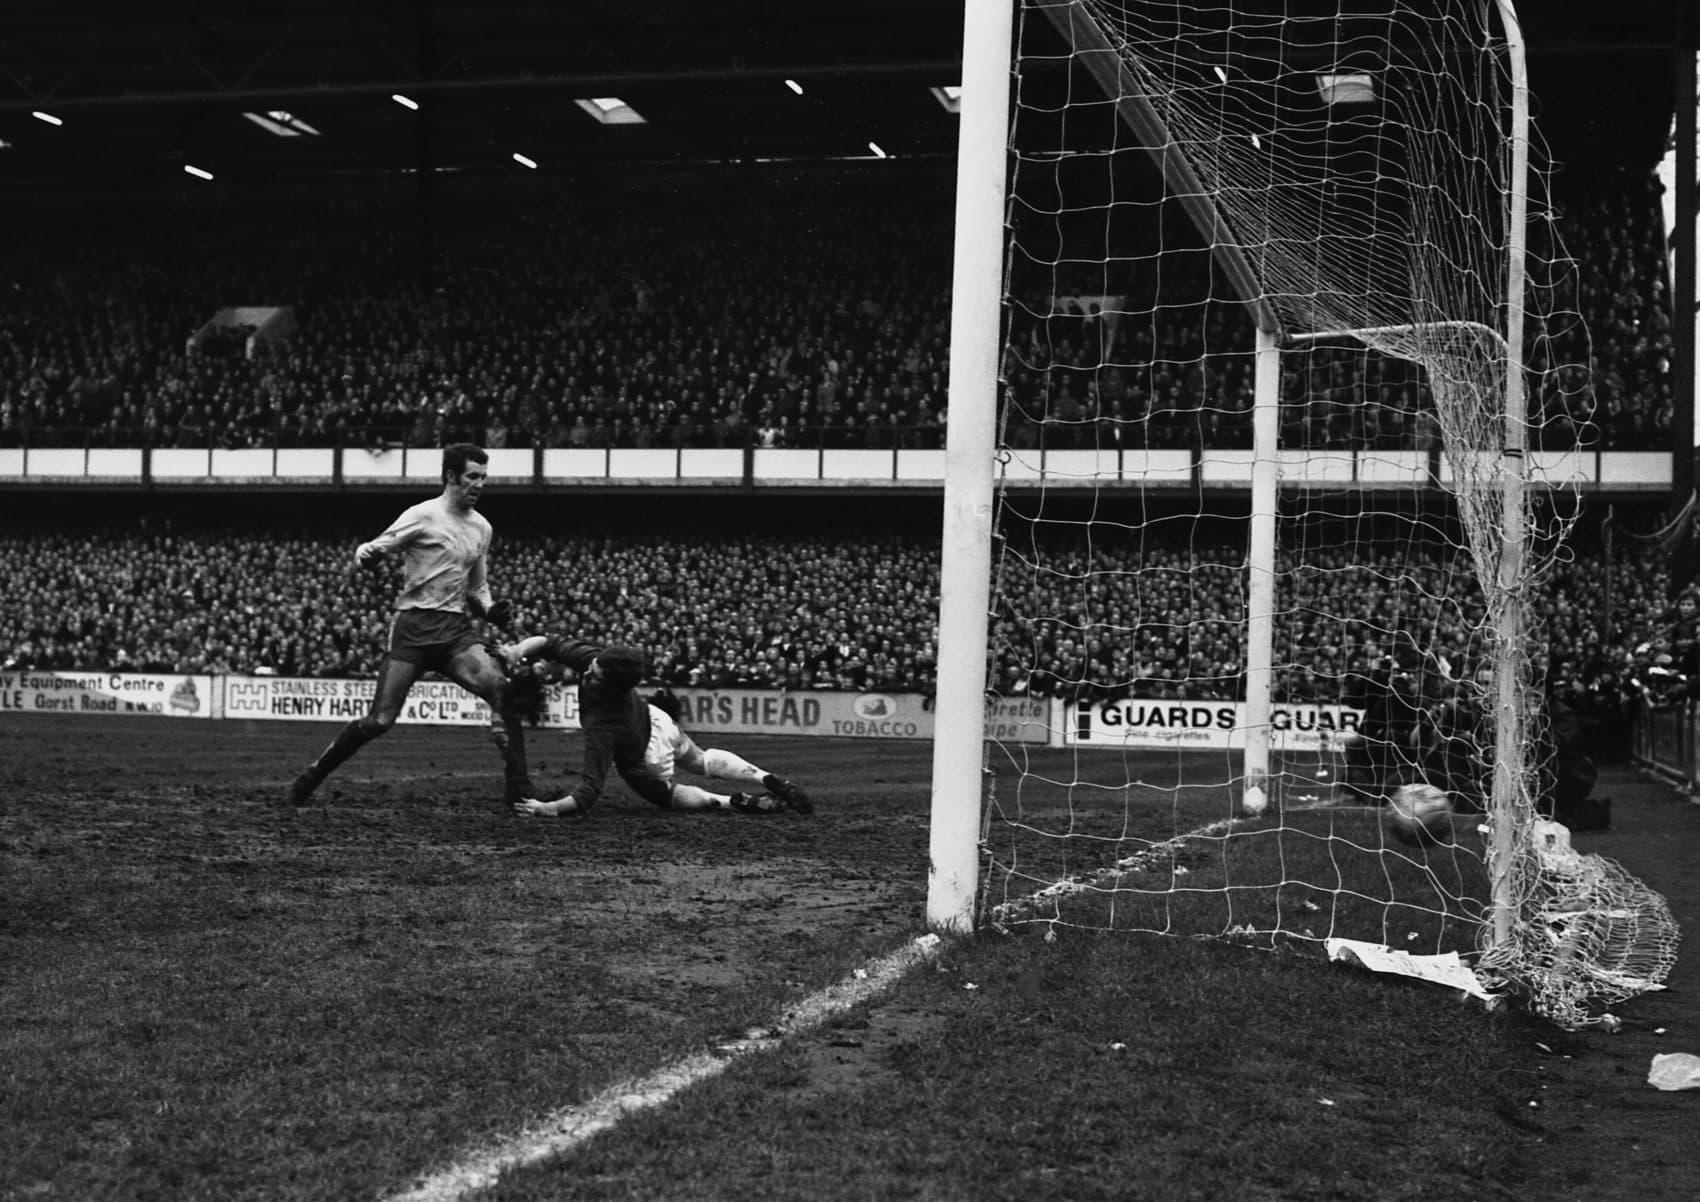 A 1970 photo from QPR's Loftus Road Stadium. (Robert Dear/AP)